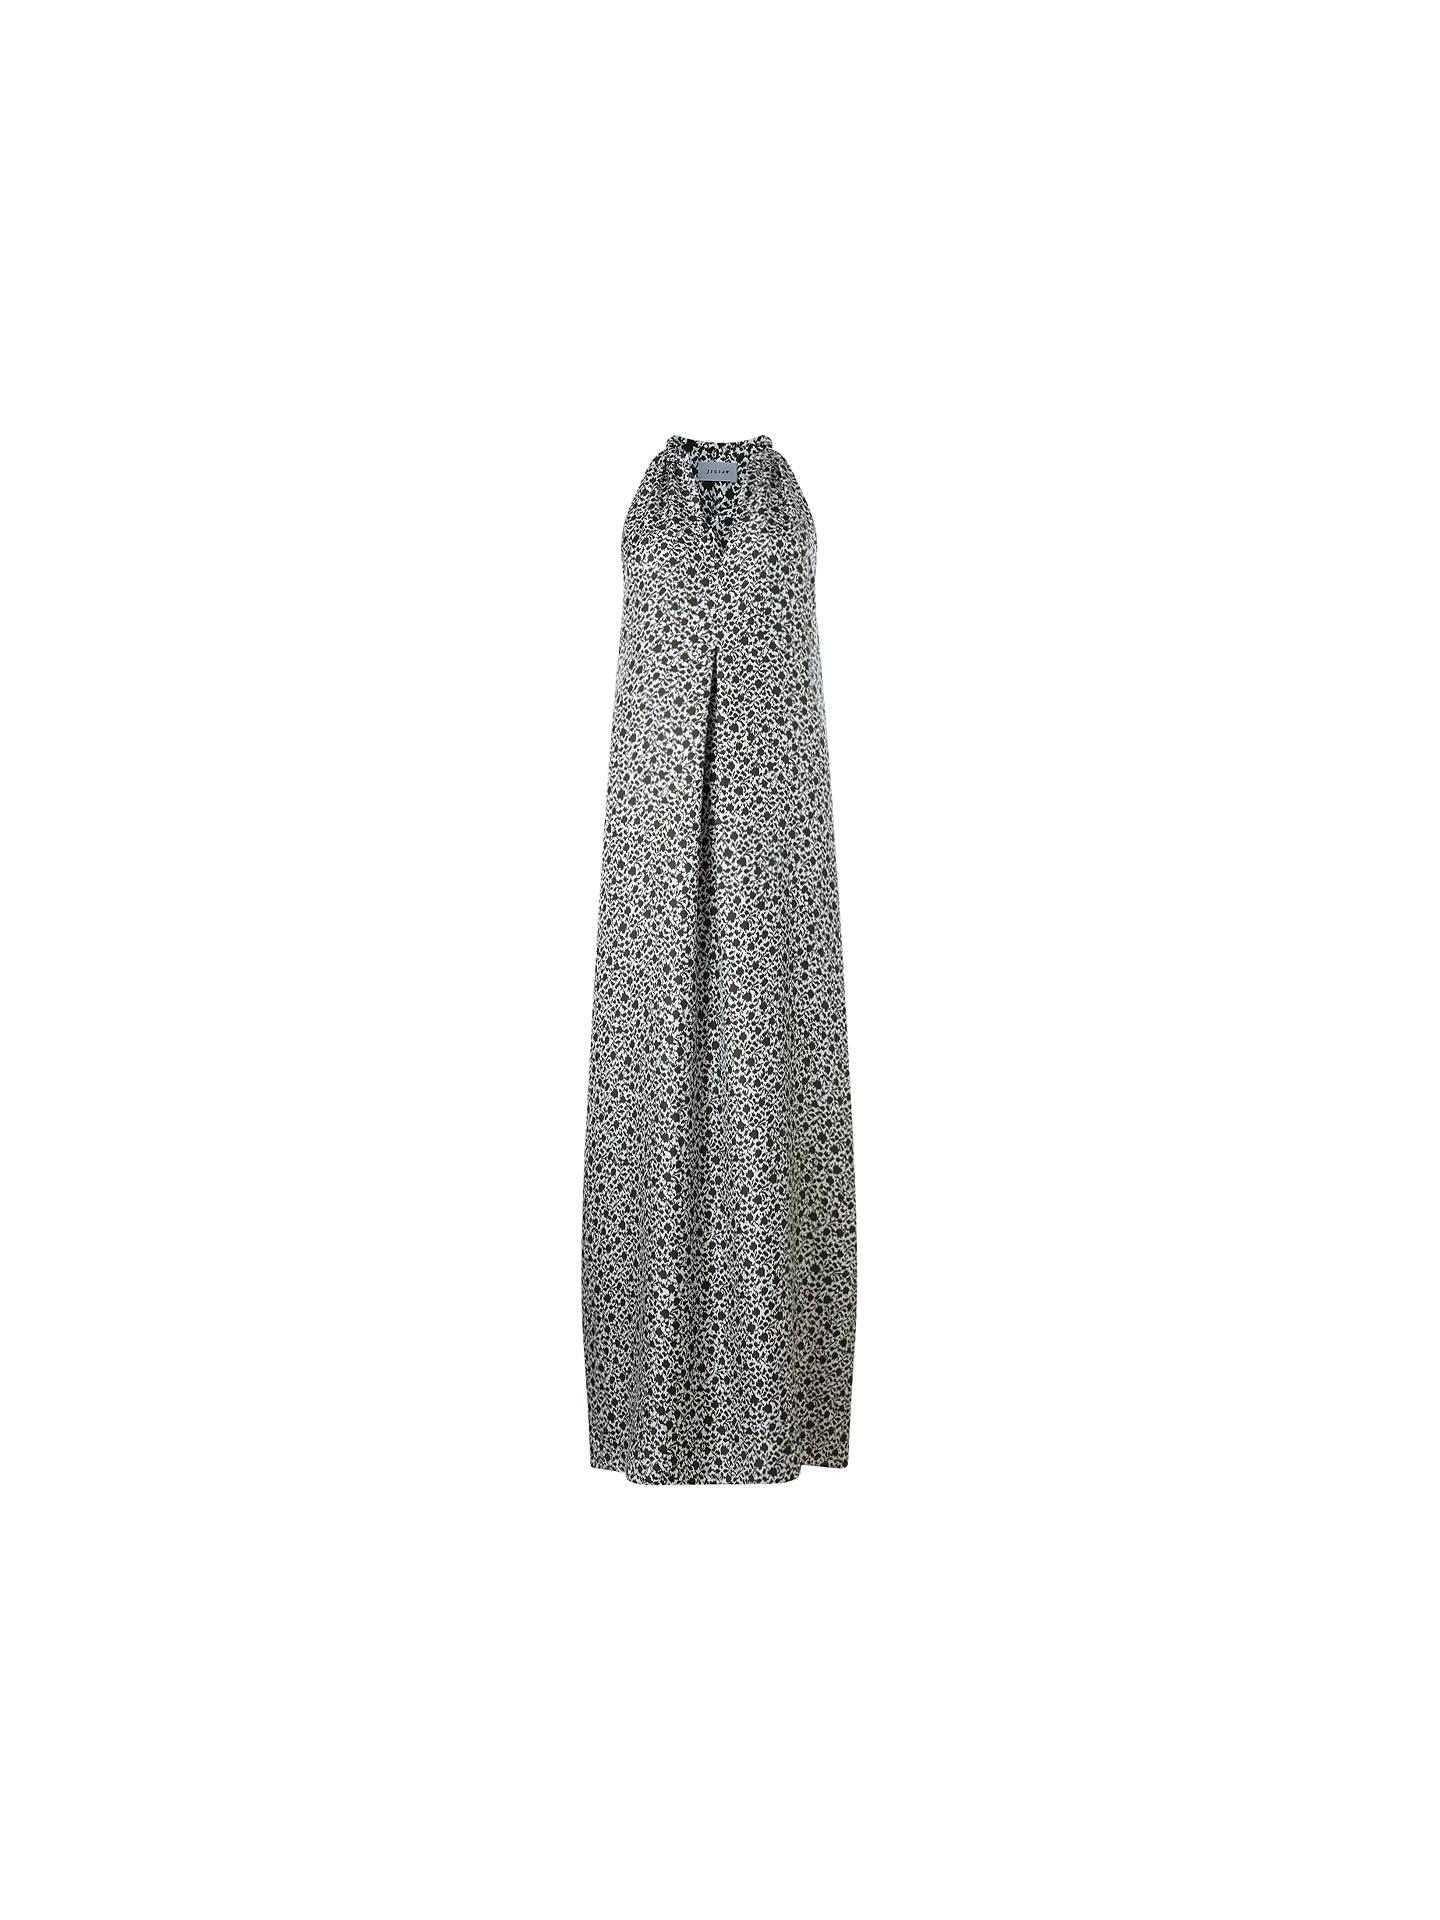 fe81a50f8de6d Jigsaw Ikat Floral Silk Maxi Dress, Green at John Lewis & Partners